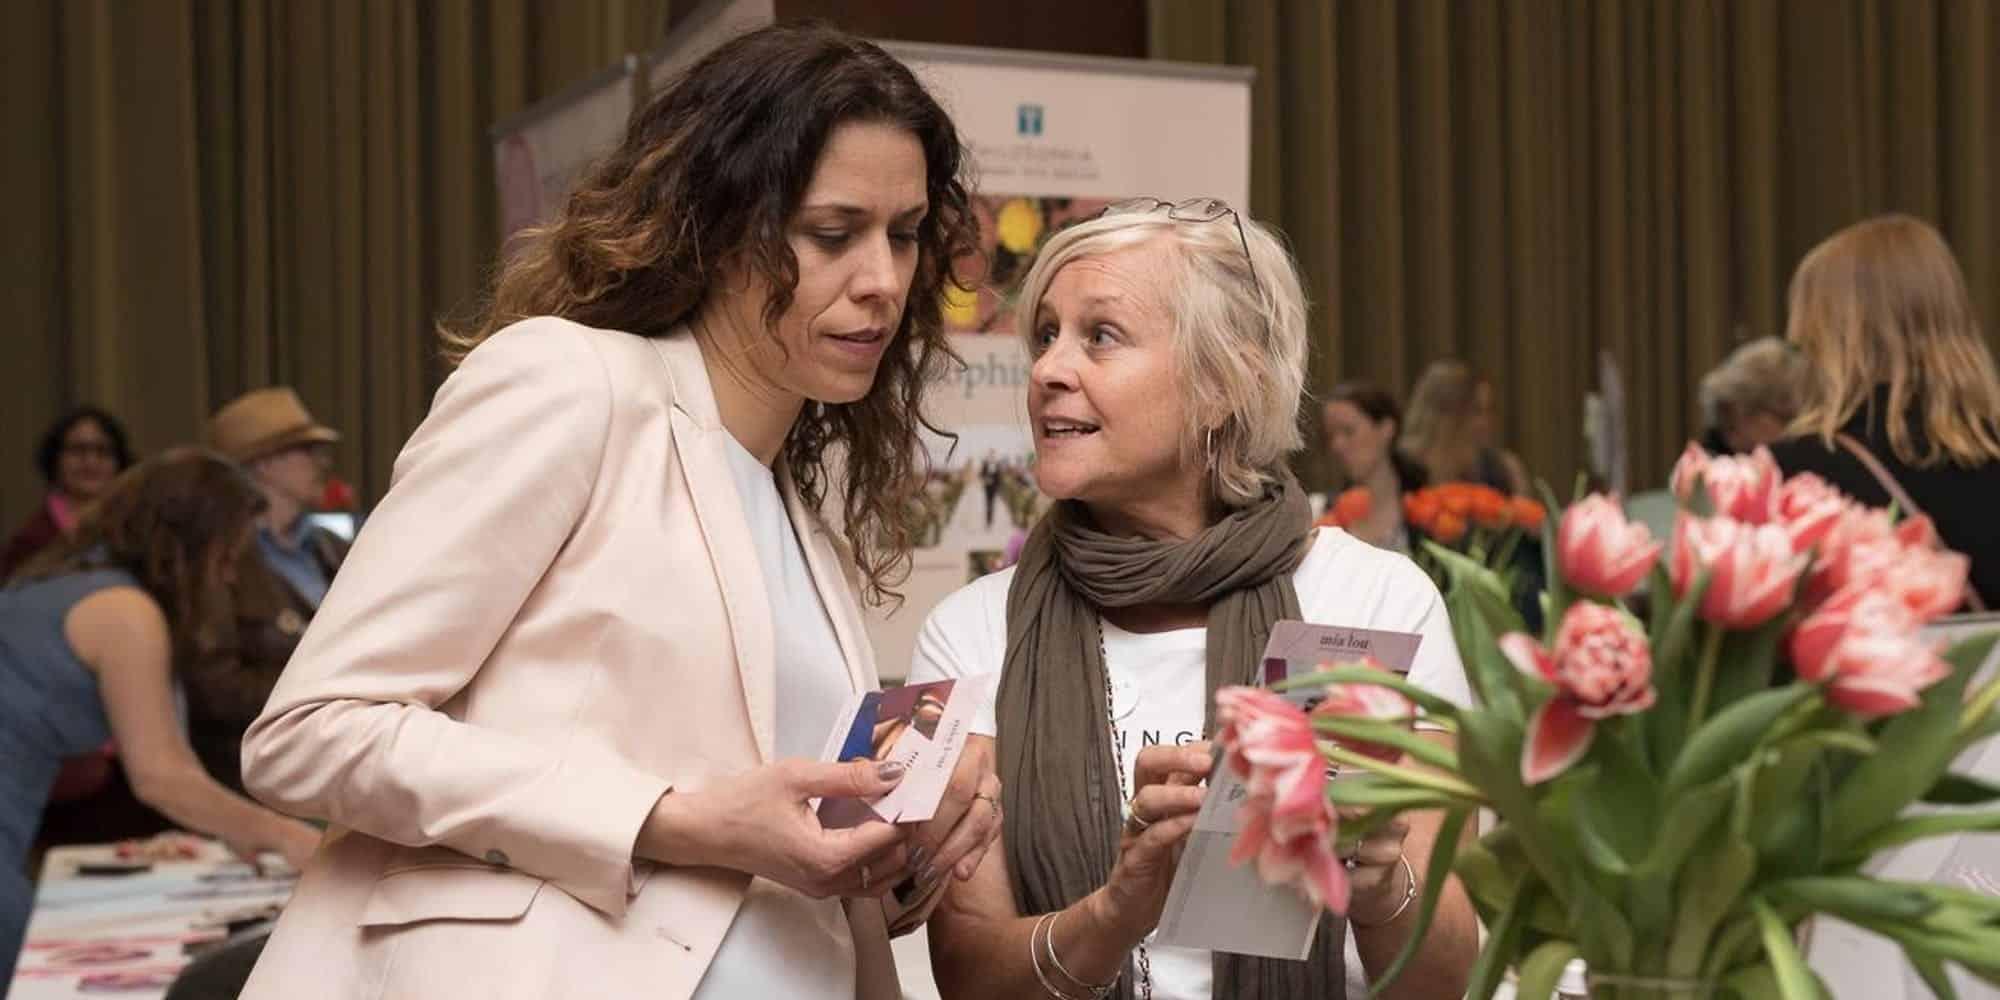 Women's Expo Zurich 24th March 2019